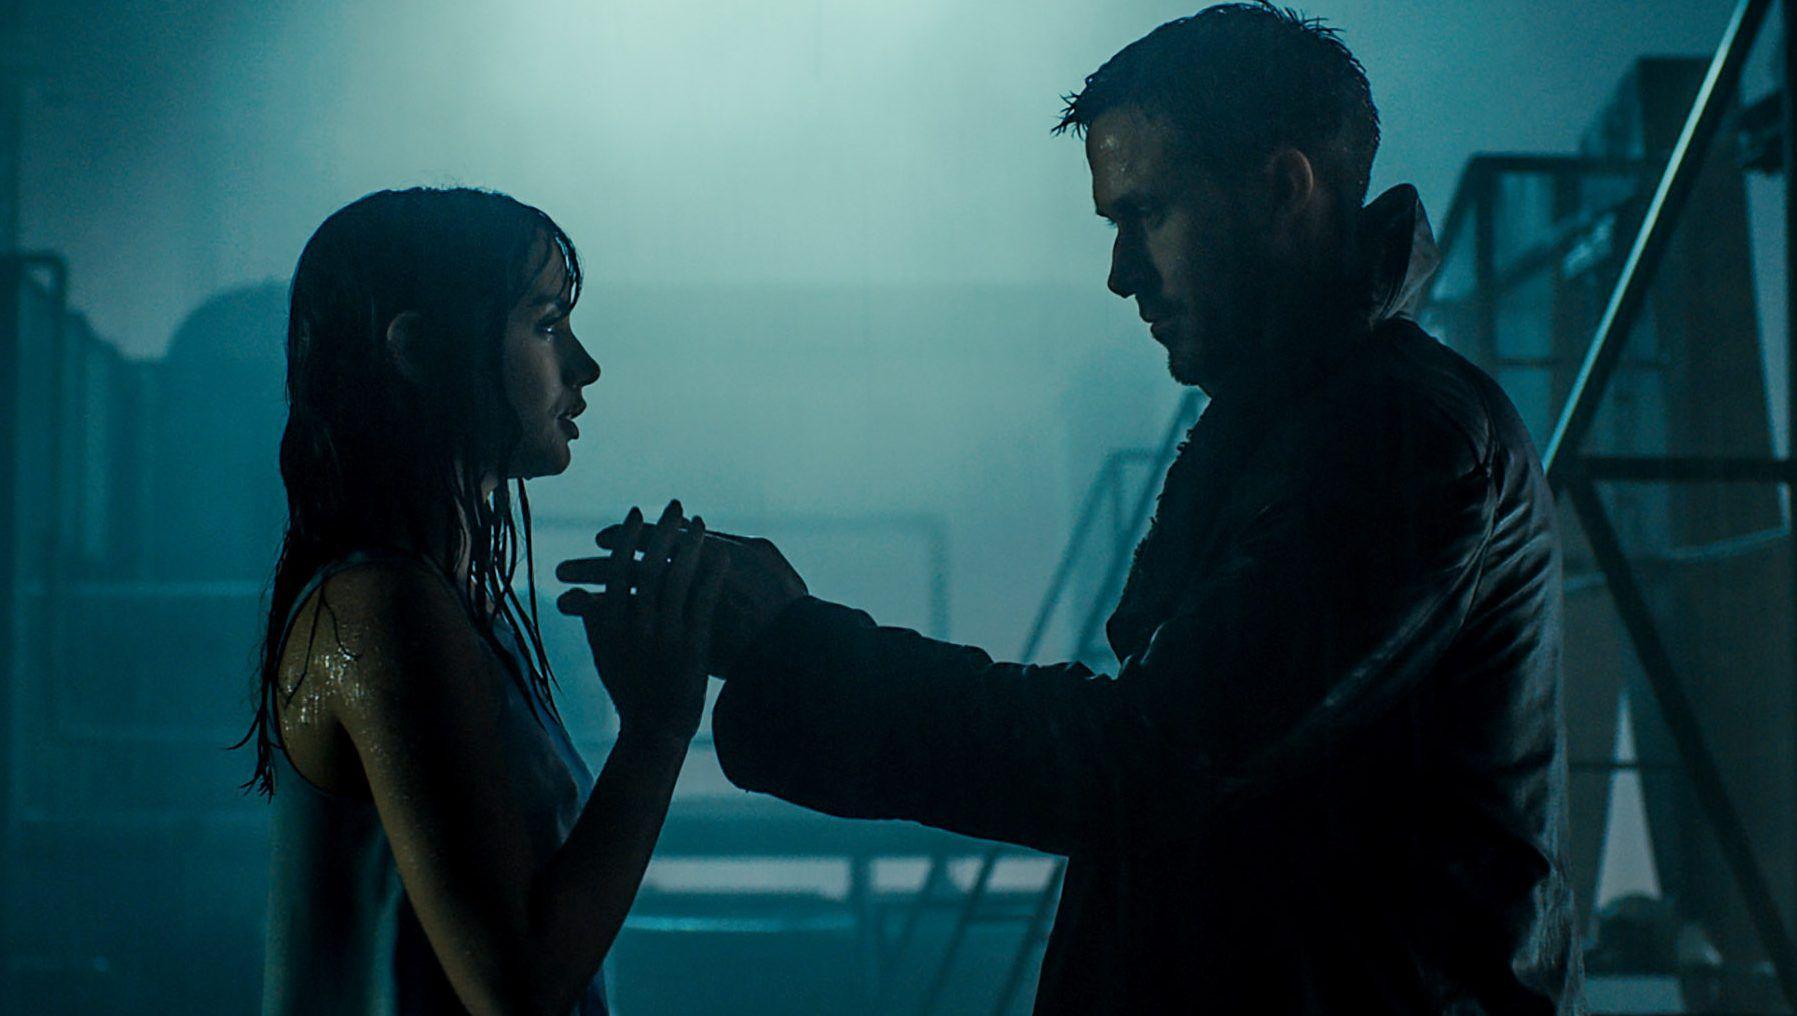 Una reflexión sobre Blade Runner 2049